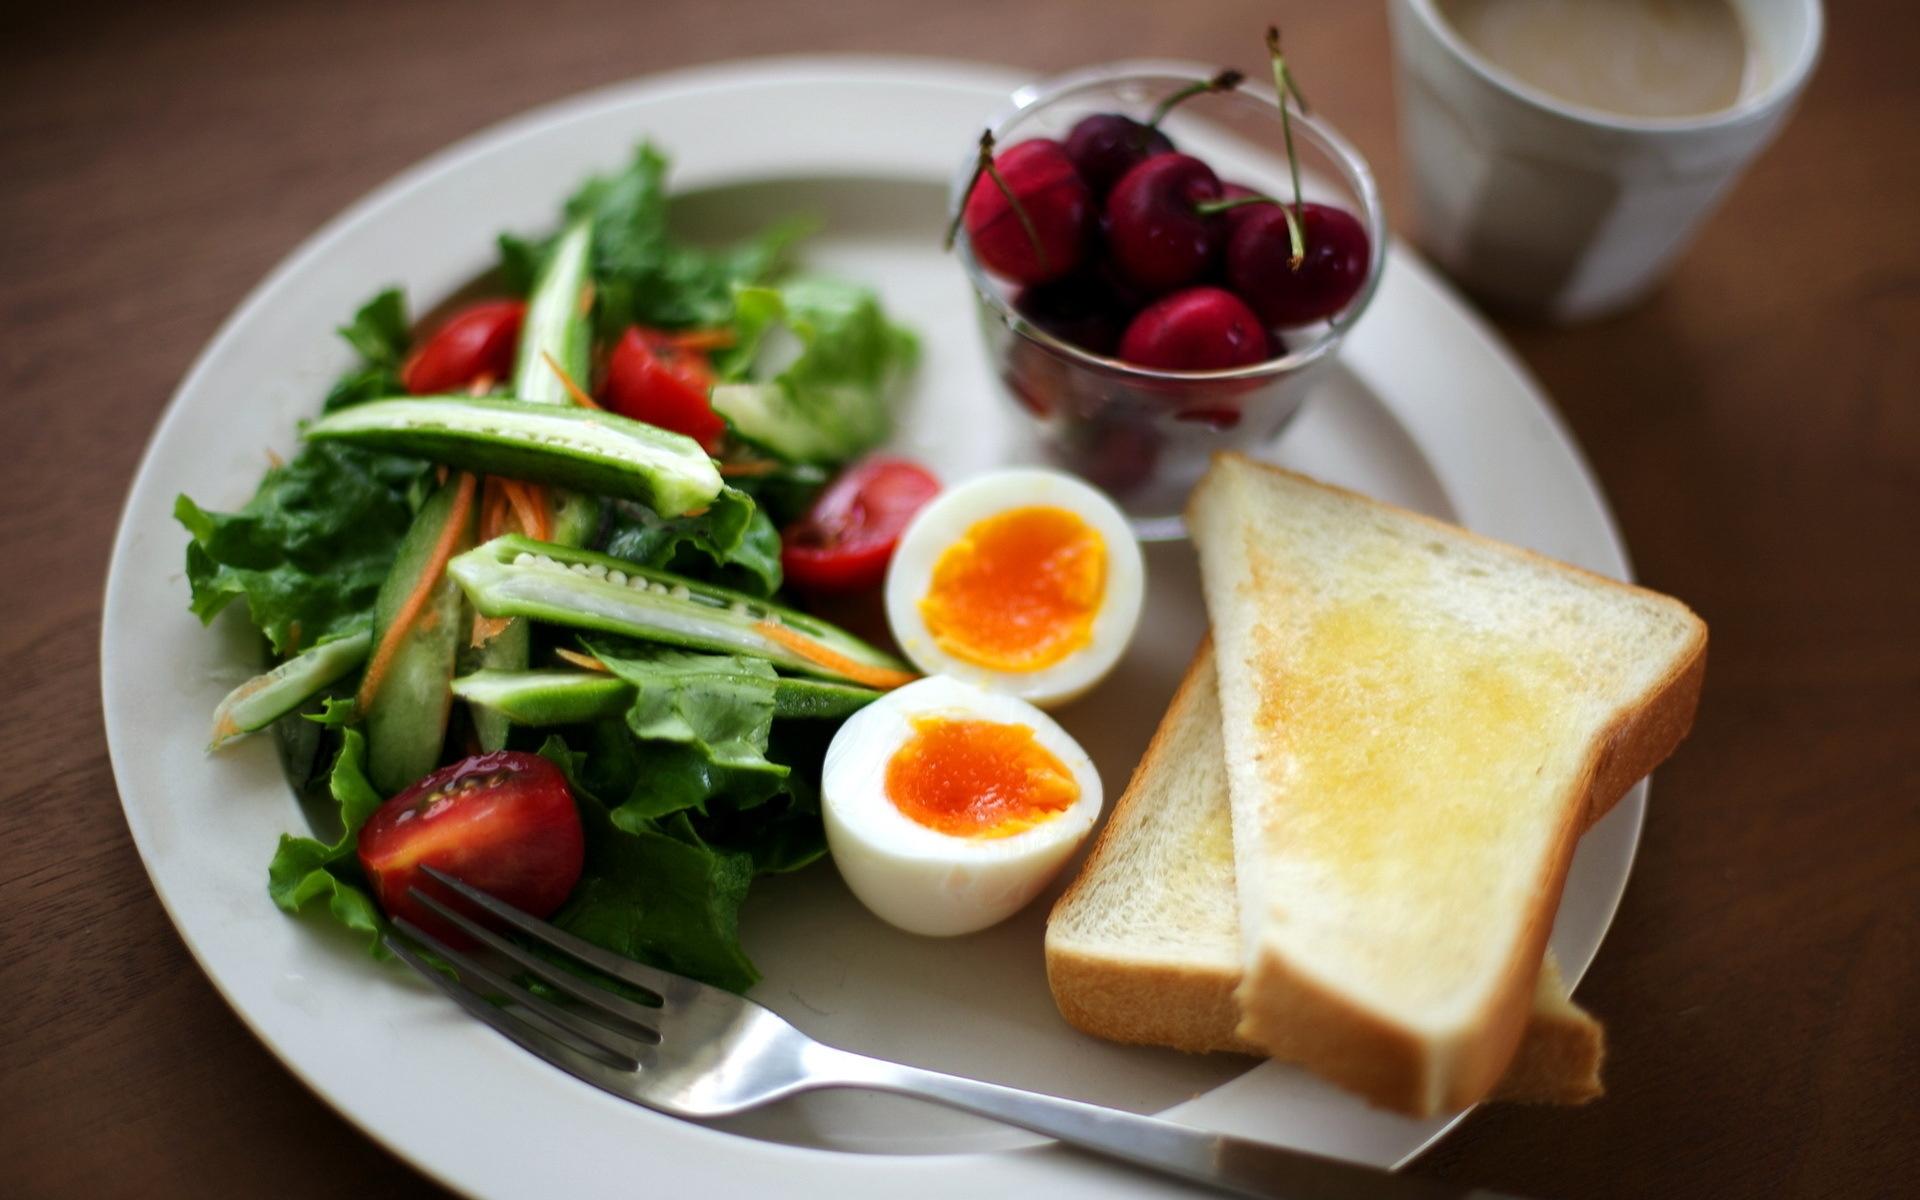 wallpapers breakfast food: Wallpaper : Background, Food, Breakfast 1920x1200